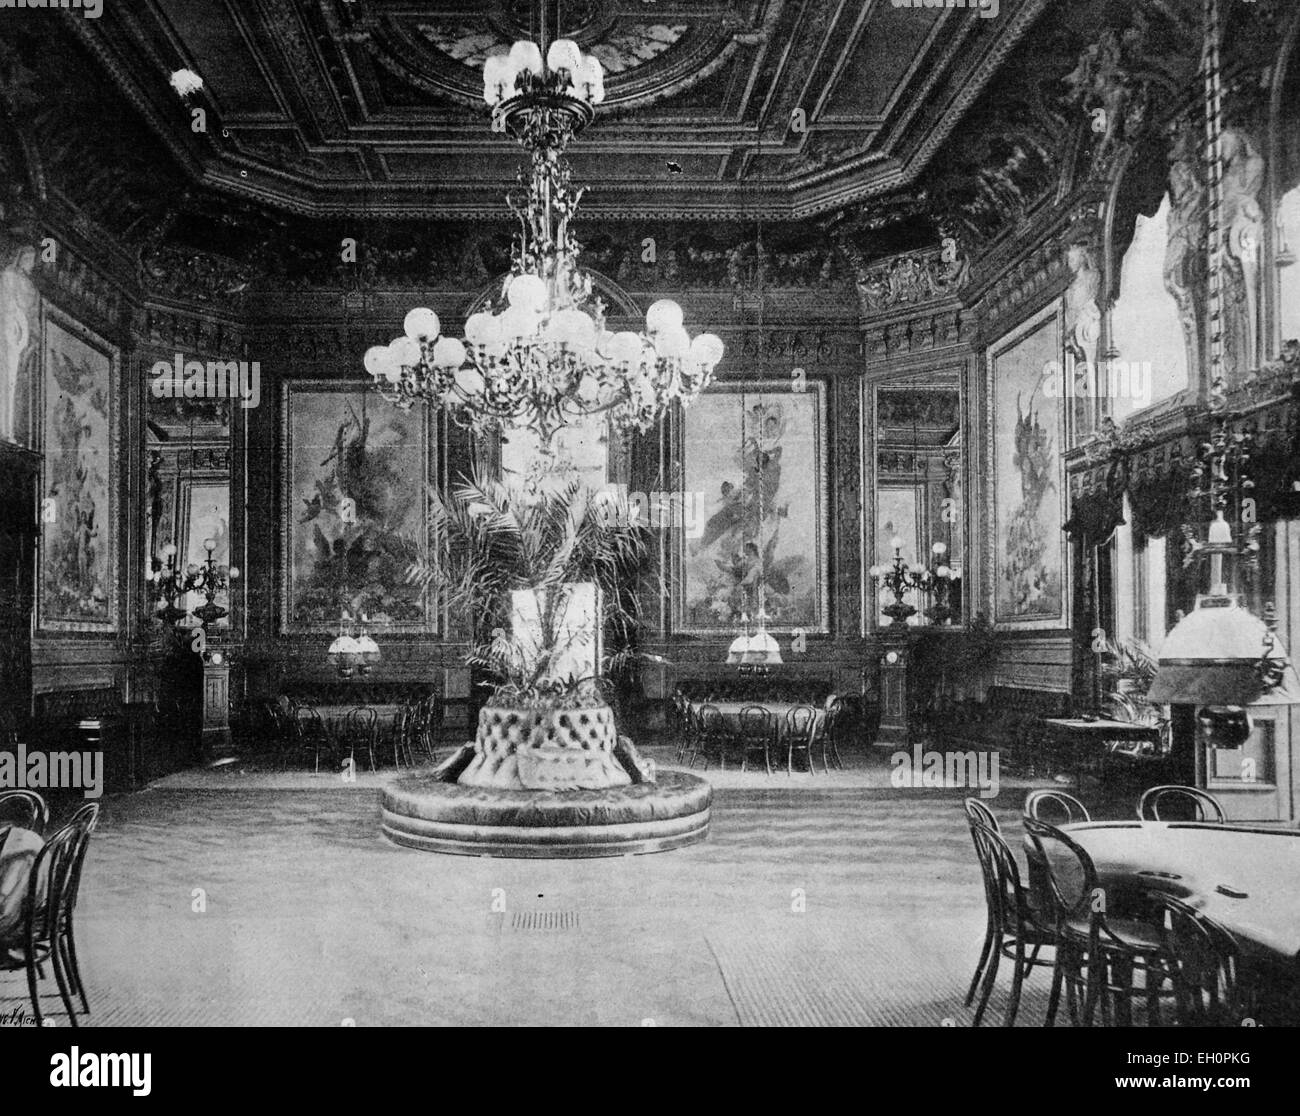 Early autotype of the La Salle des Jeux in Aix-les-Bains, Rhone-Alpes, France, historical photo, 1884 - Stock Image